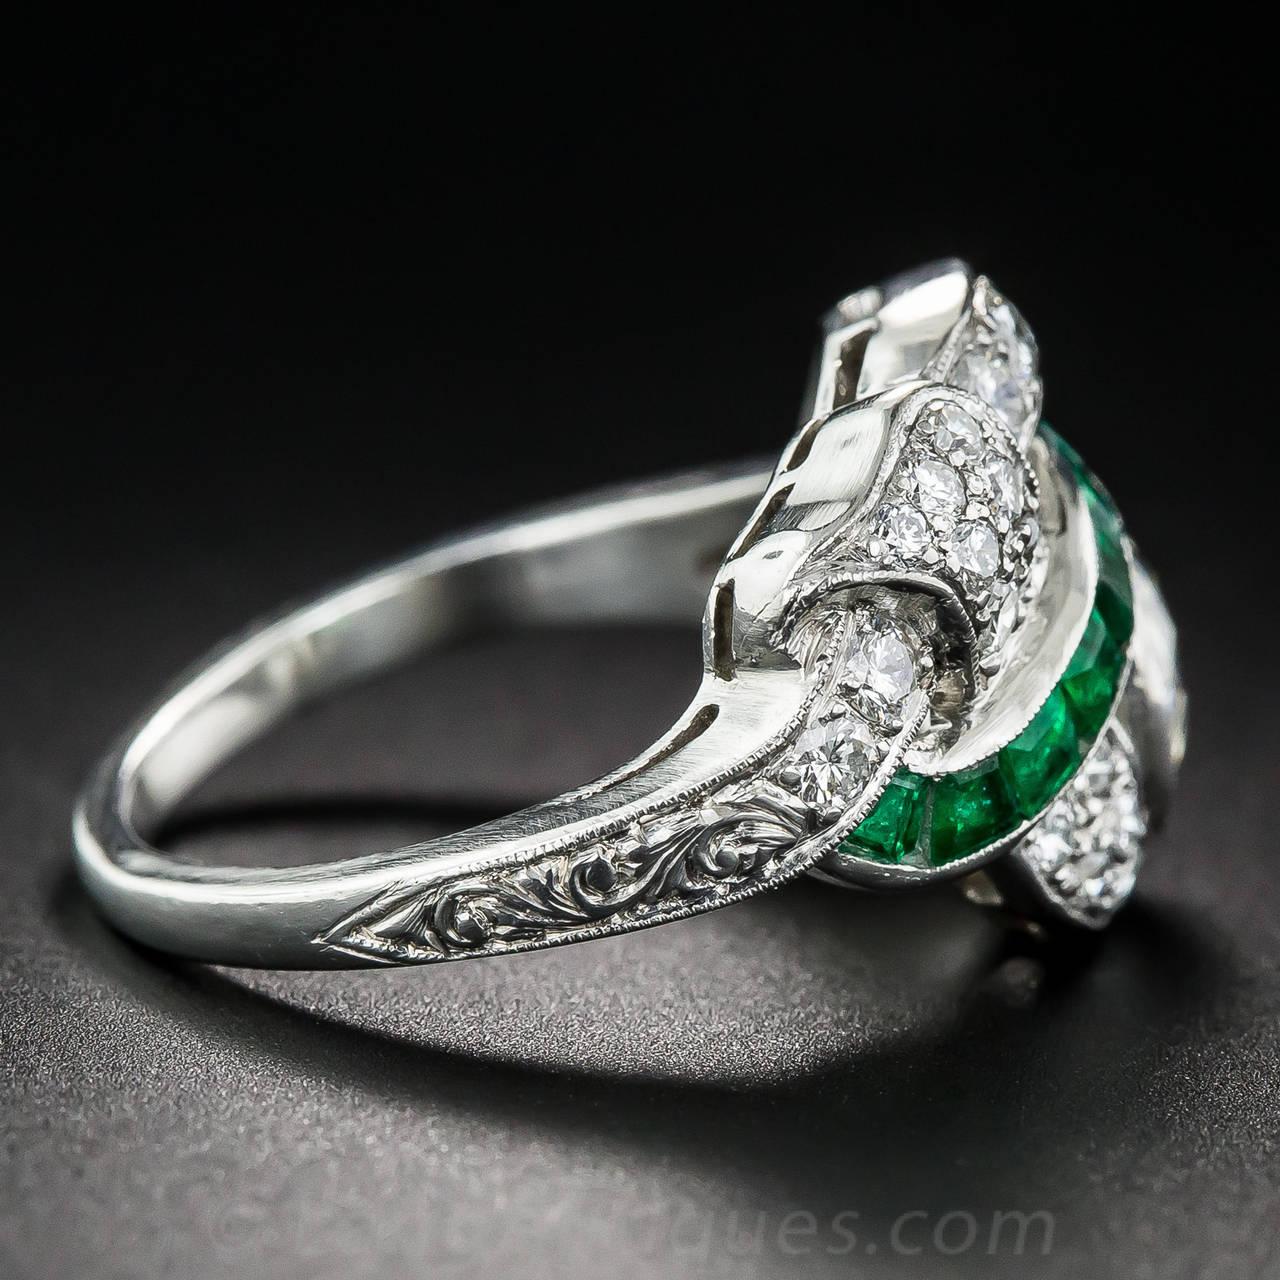 Art Deco 1.97 Carat Center Diamond and Emerald Ring 4